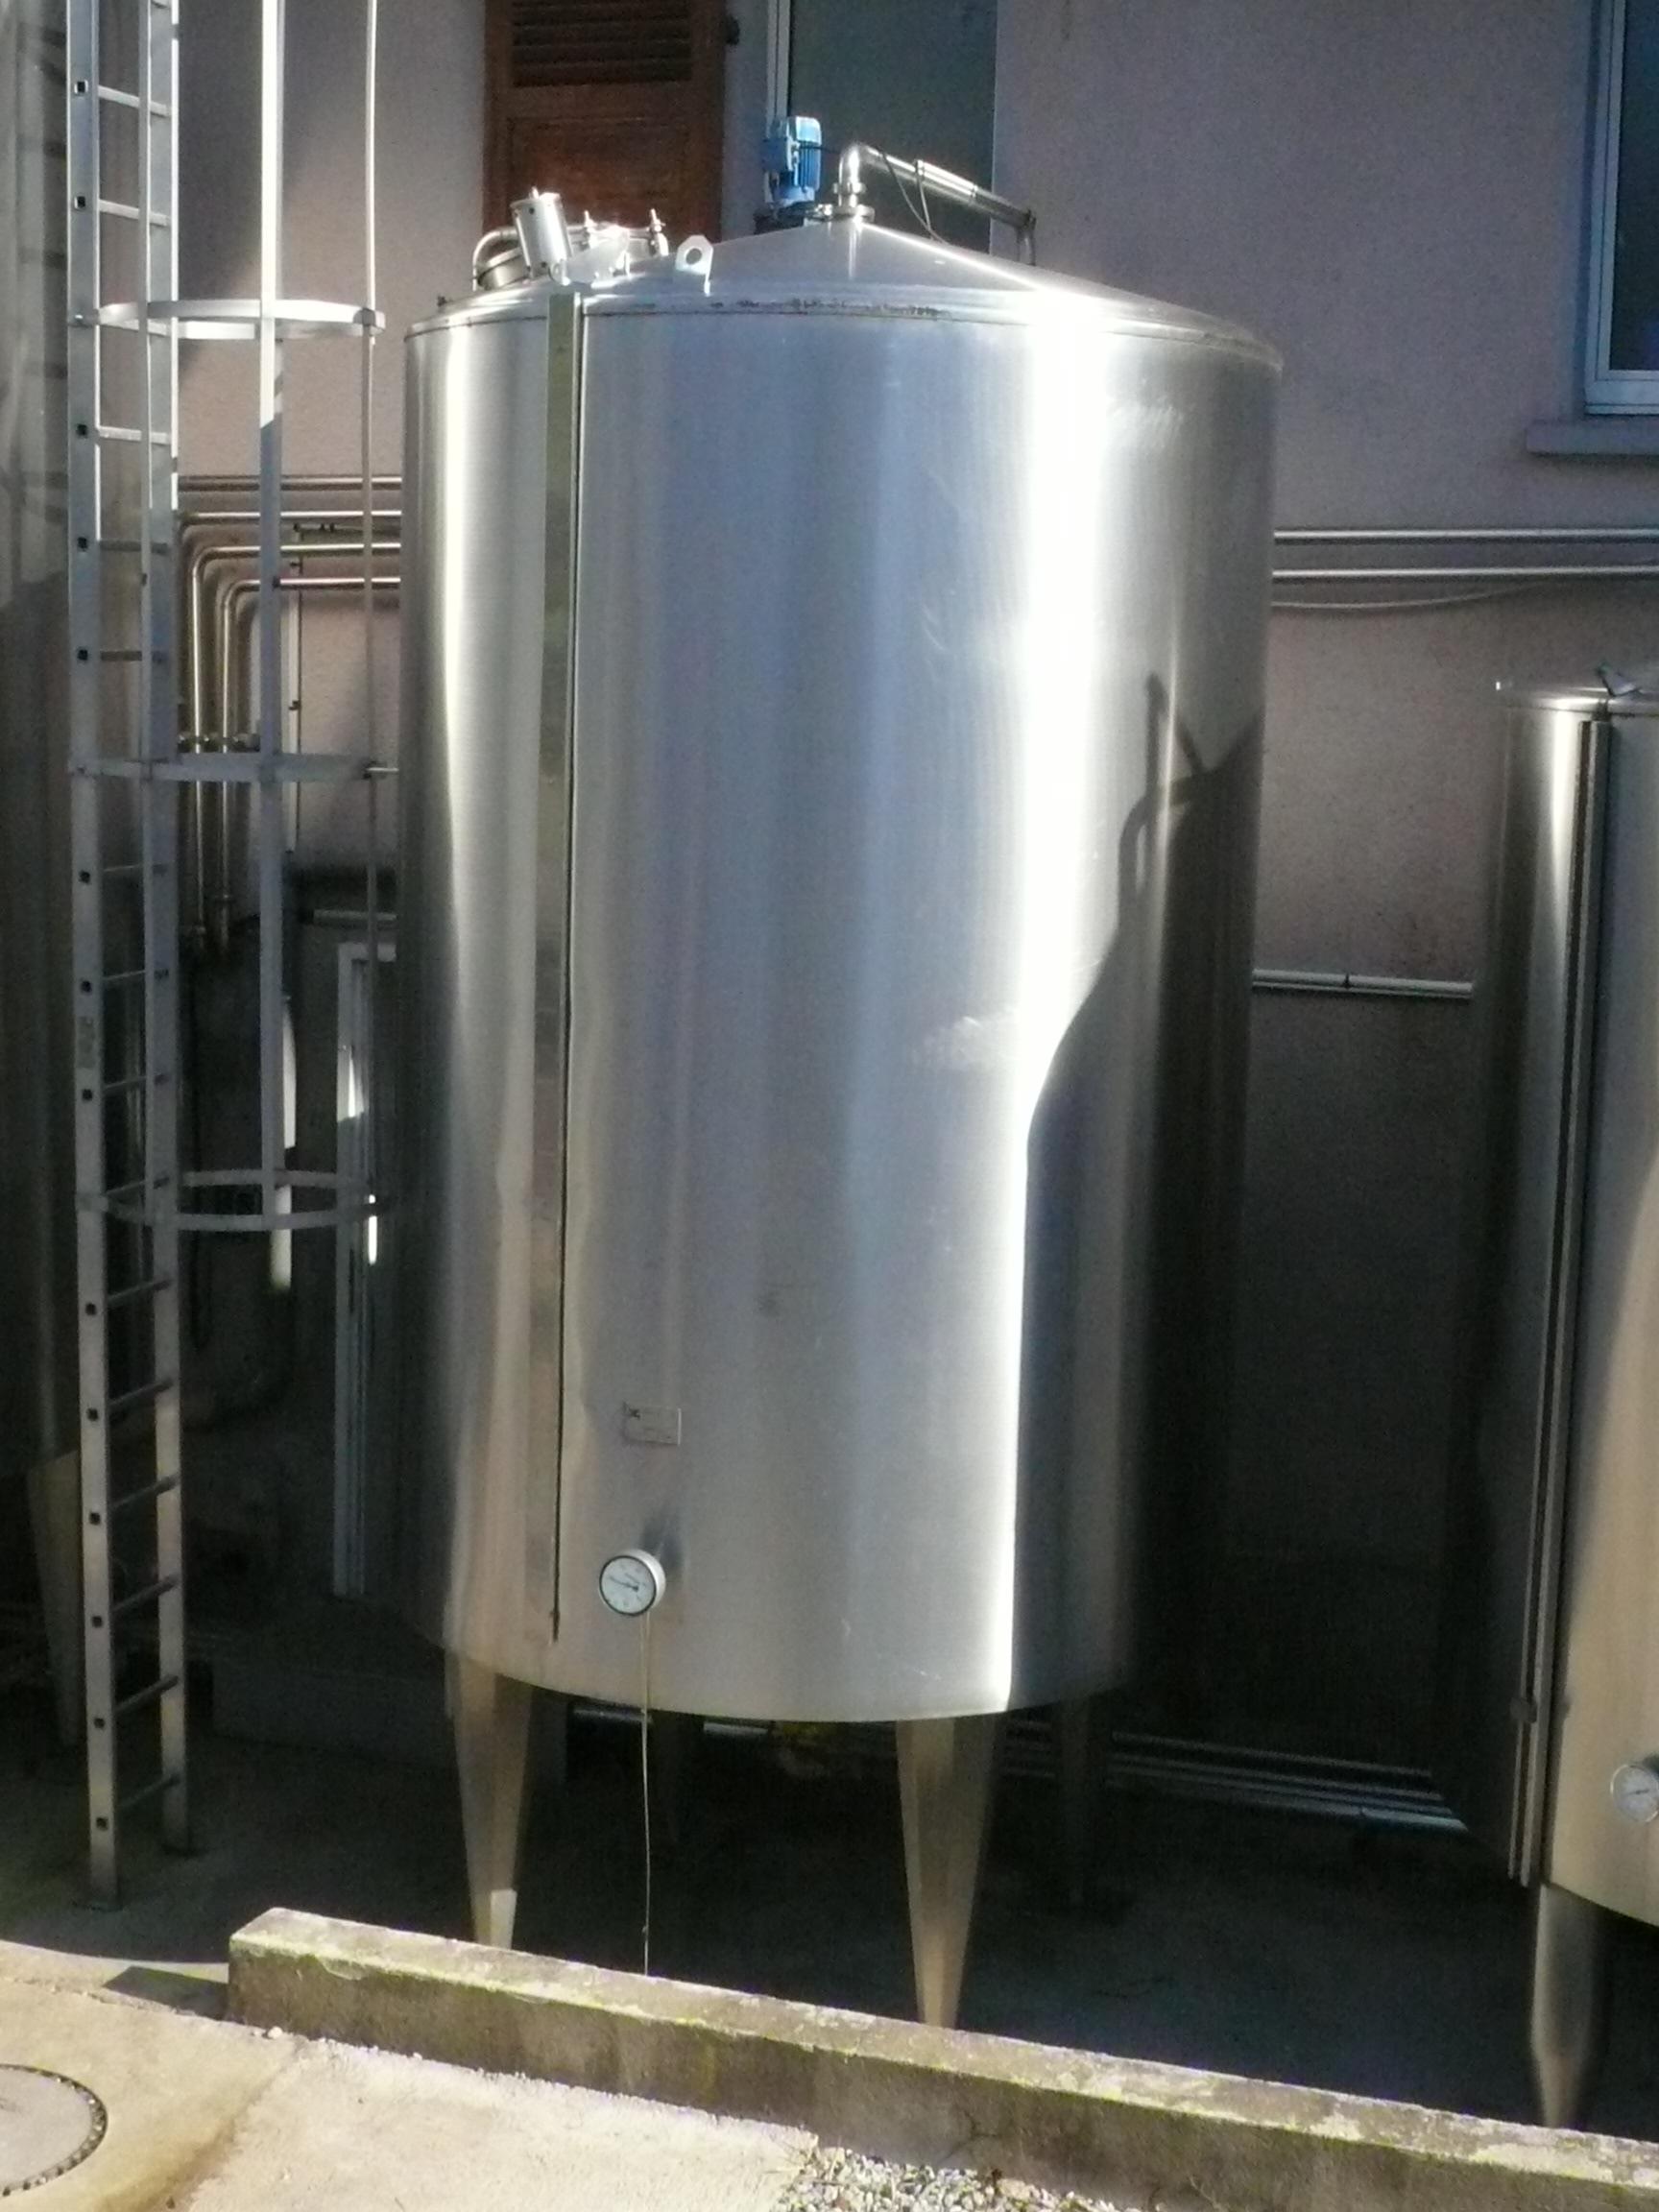 Tanque de leche wikipedia la enciclopedia libre for Estanque para agua caliente